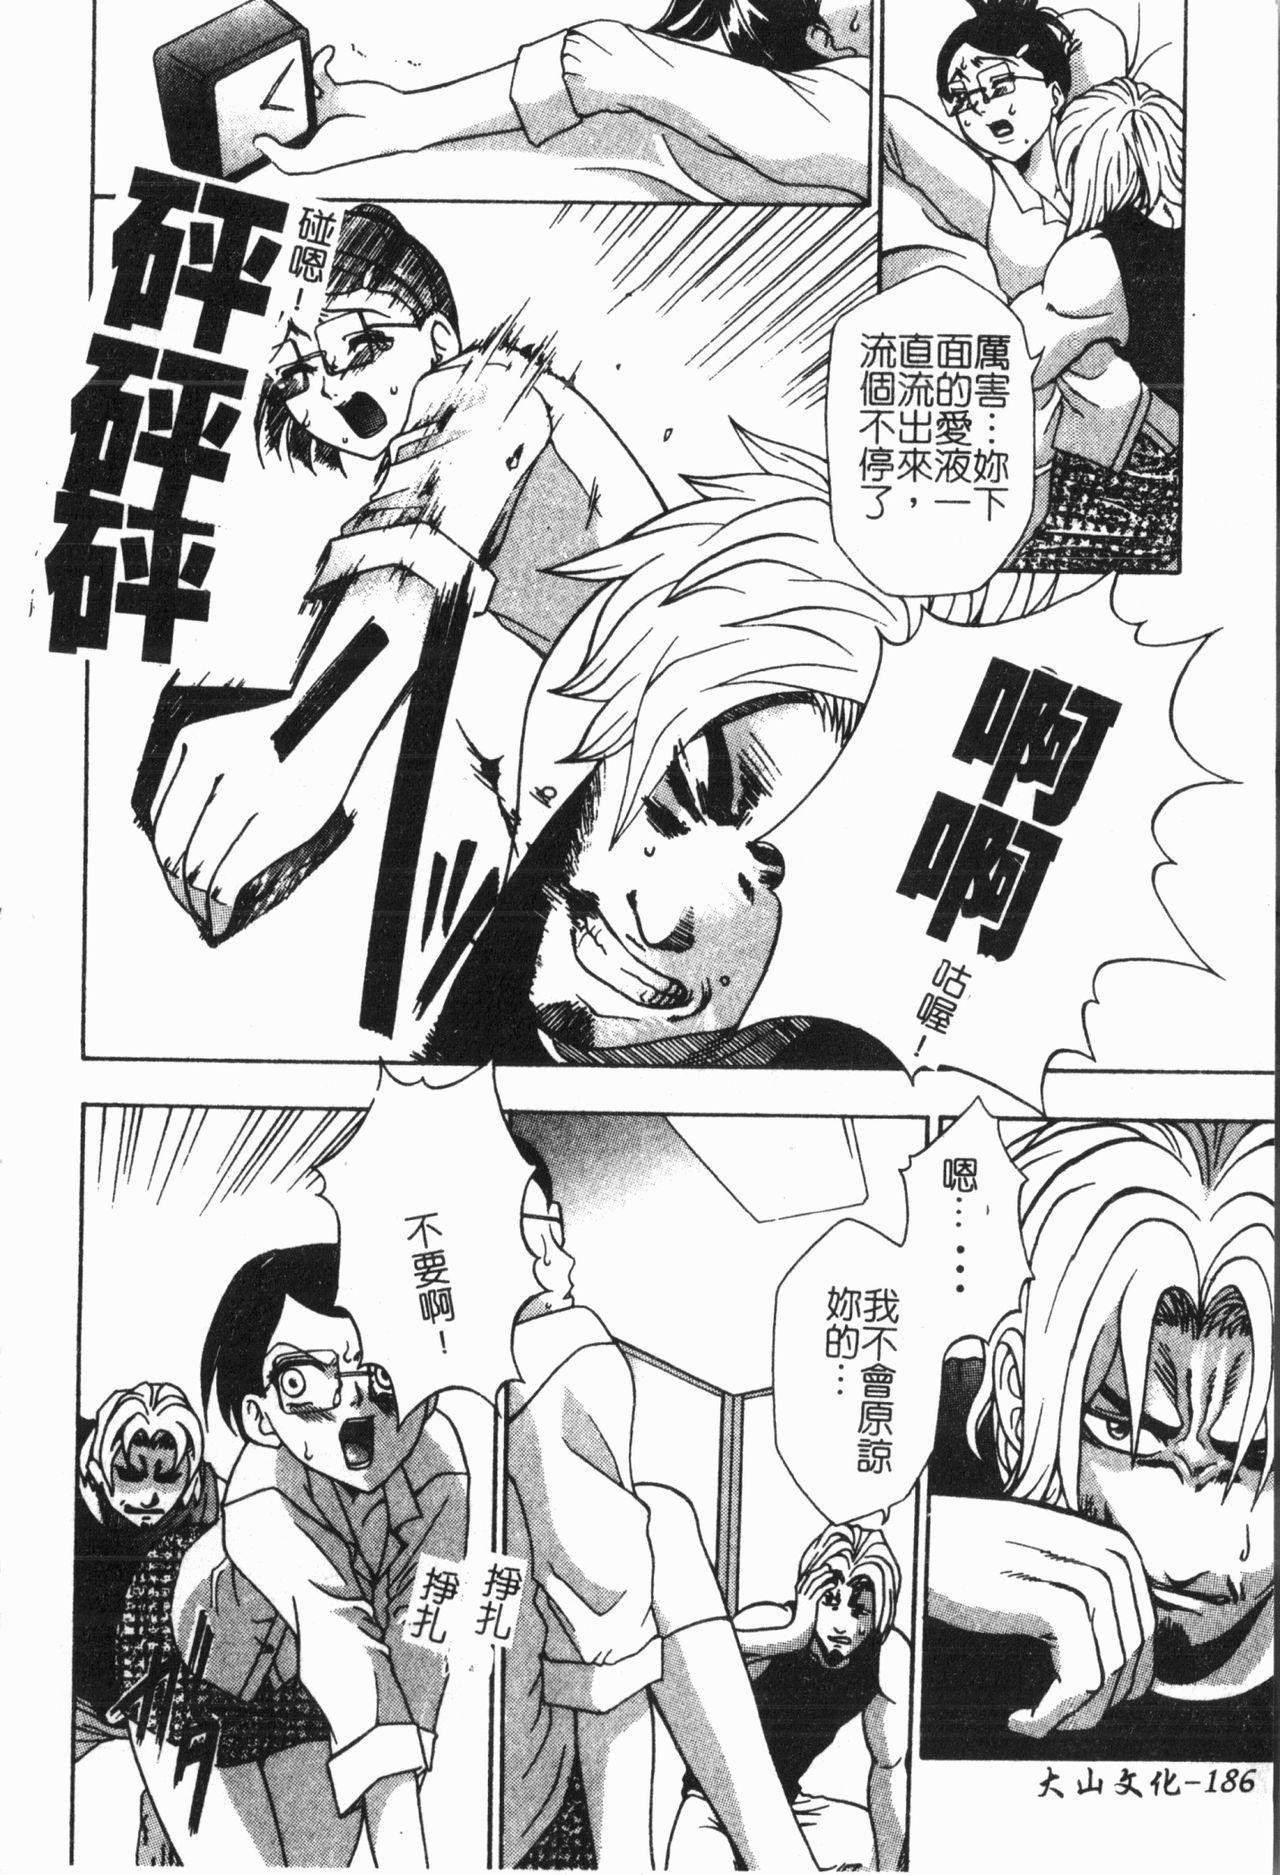 Imouto Koishi 6 188